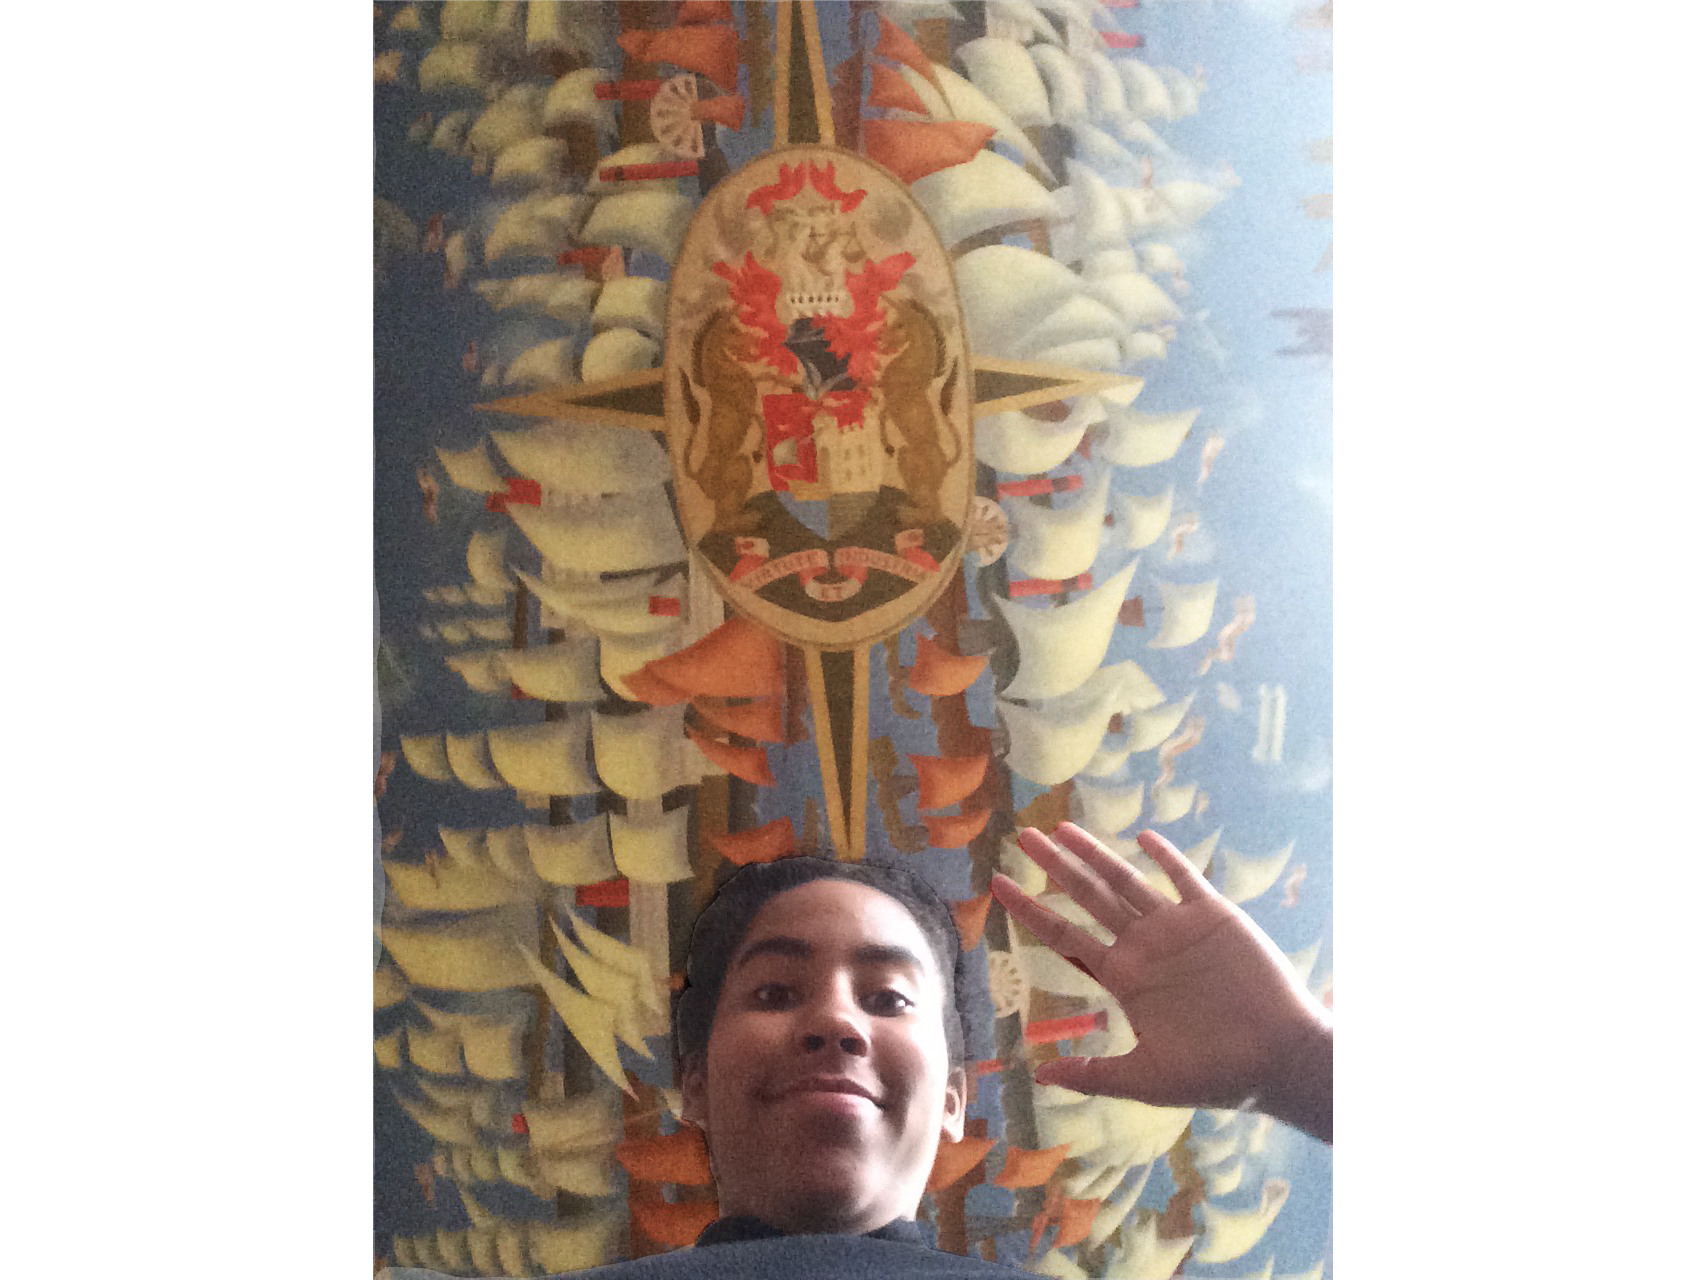 hey ceiling